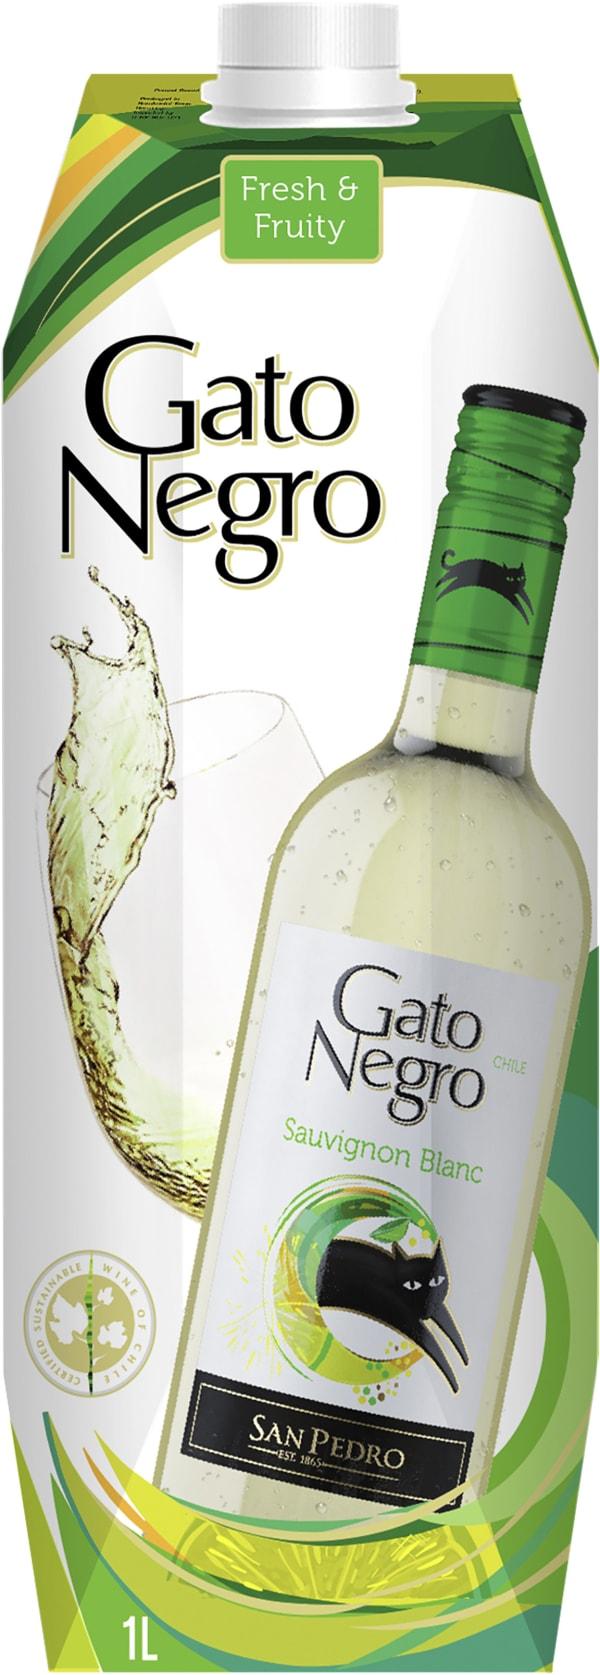 Gato Negro Sauvignon Blanc kartongförpackning